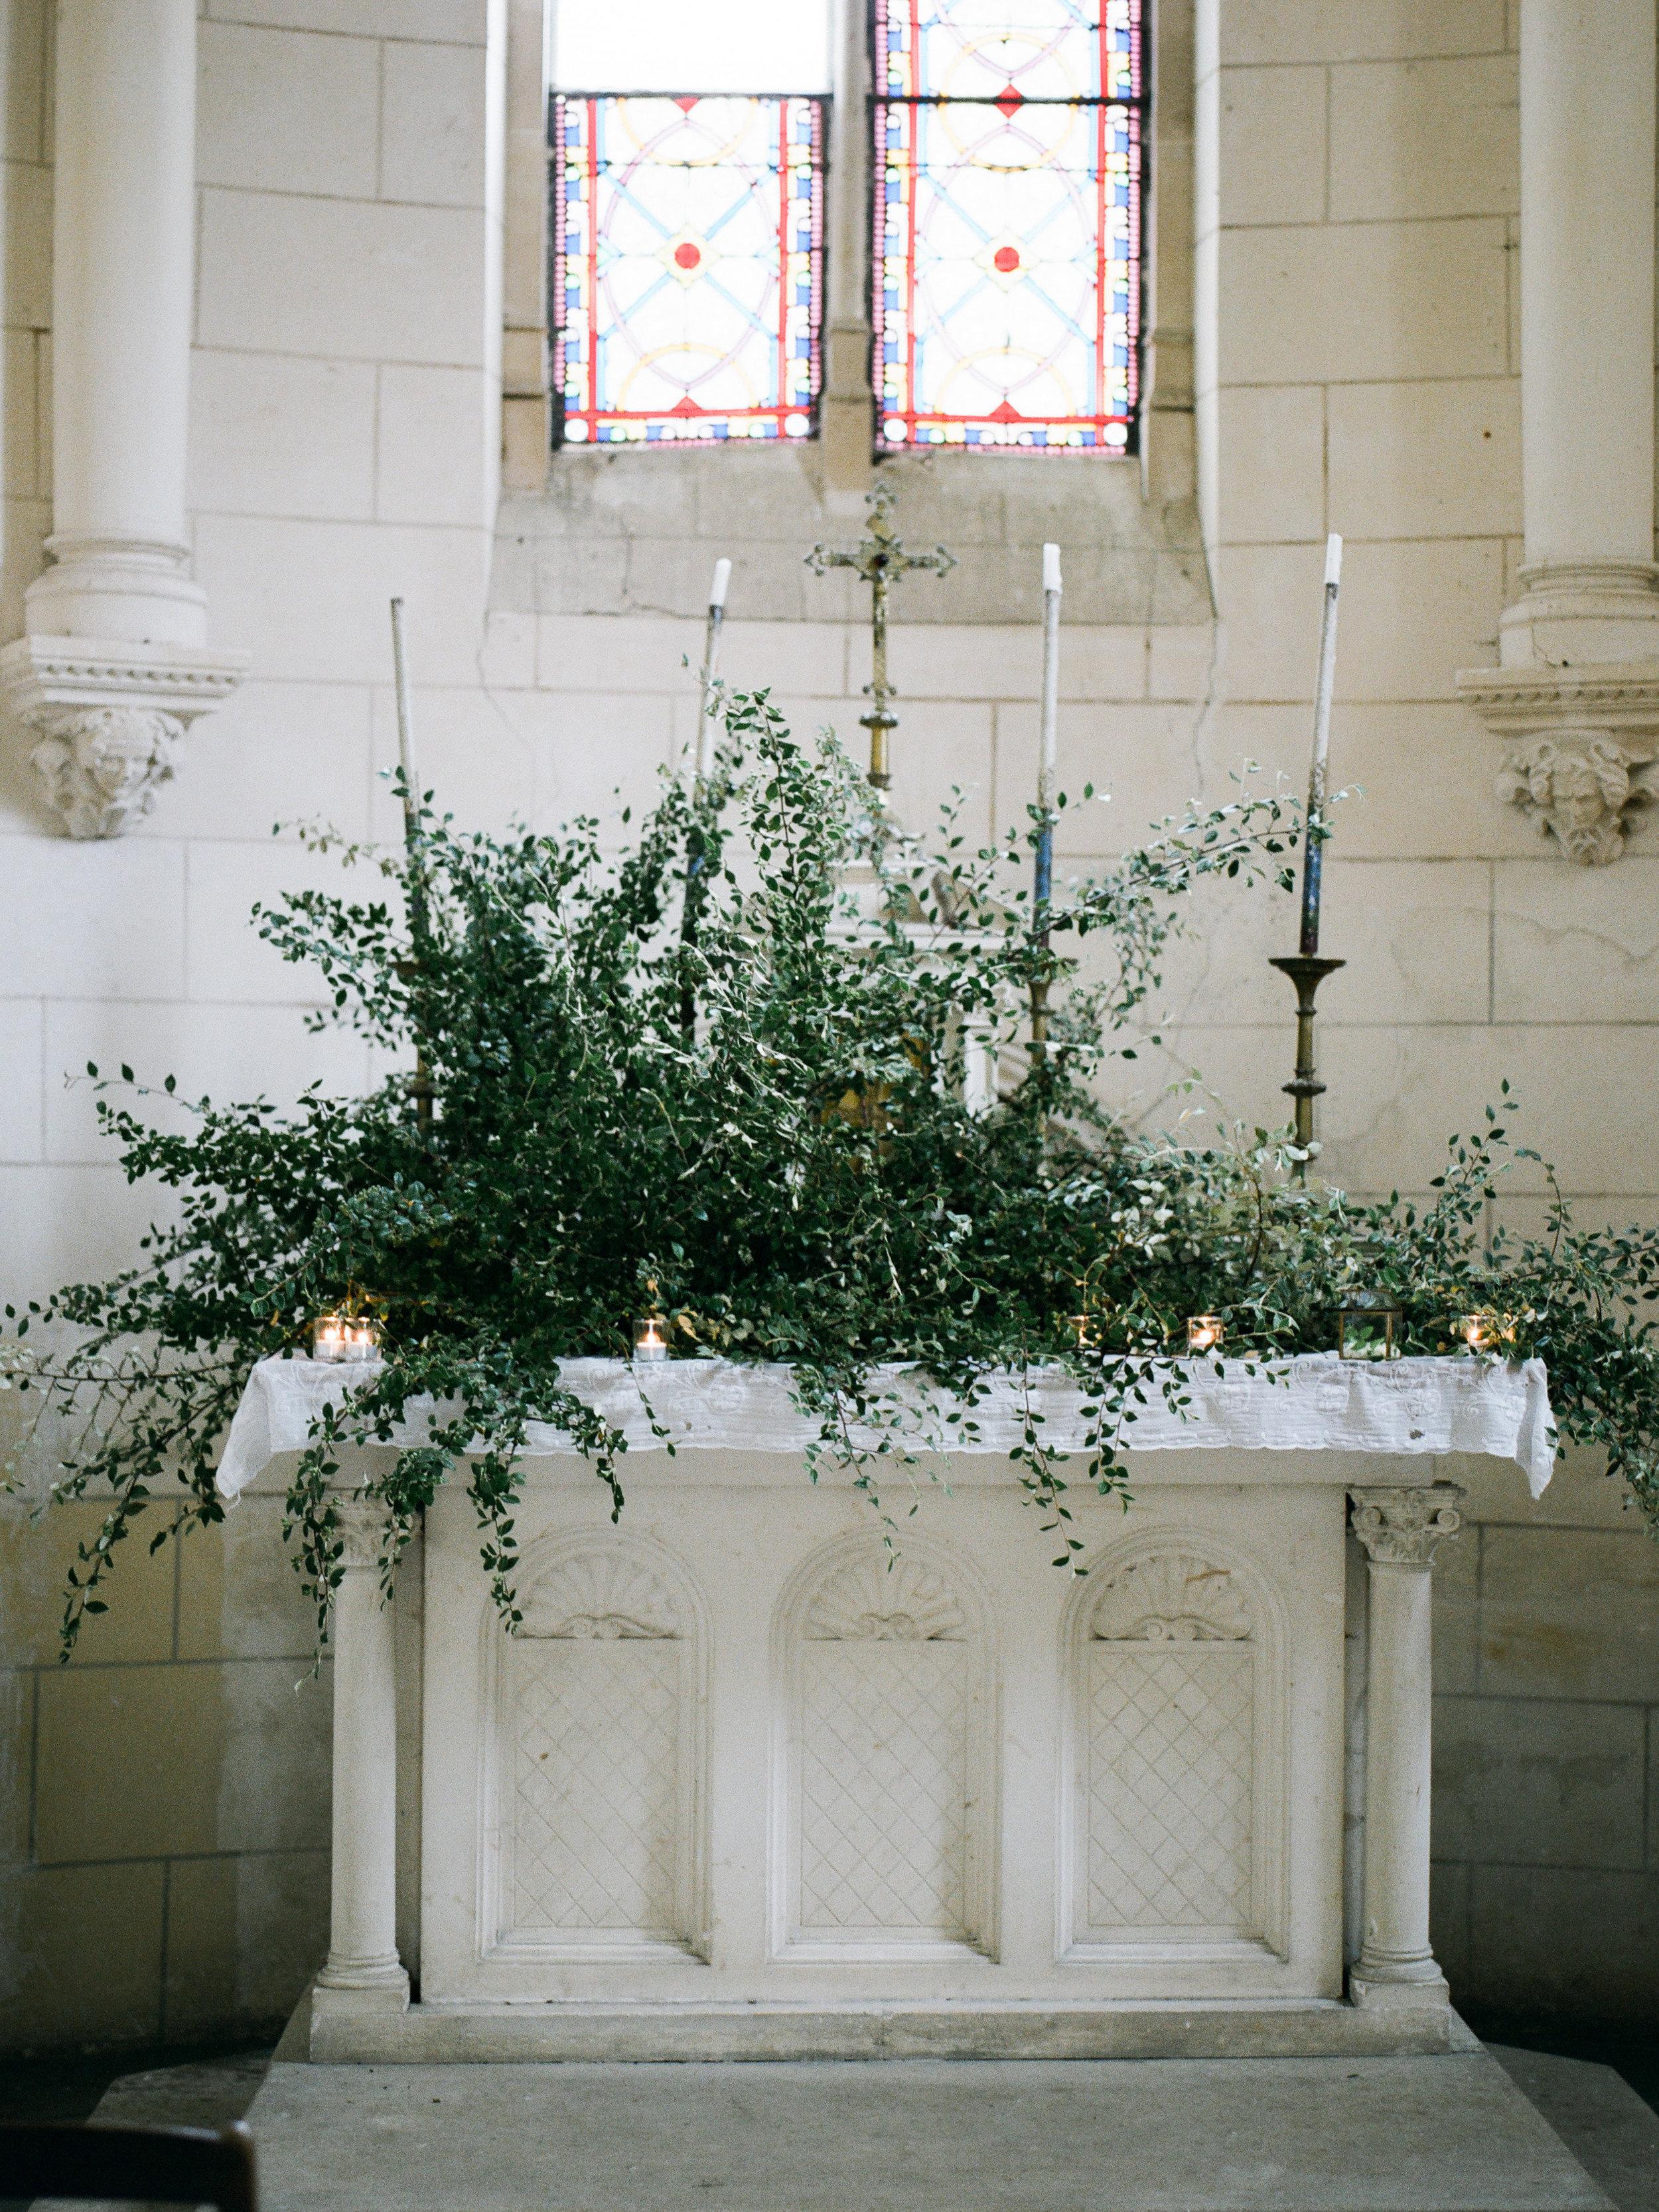 fine art wedding florist, foraged floral, wedding in paris france with charming french chateau.jpg